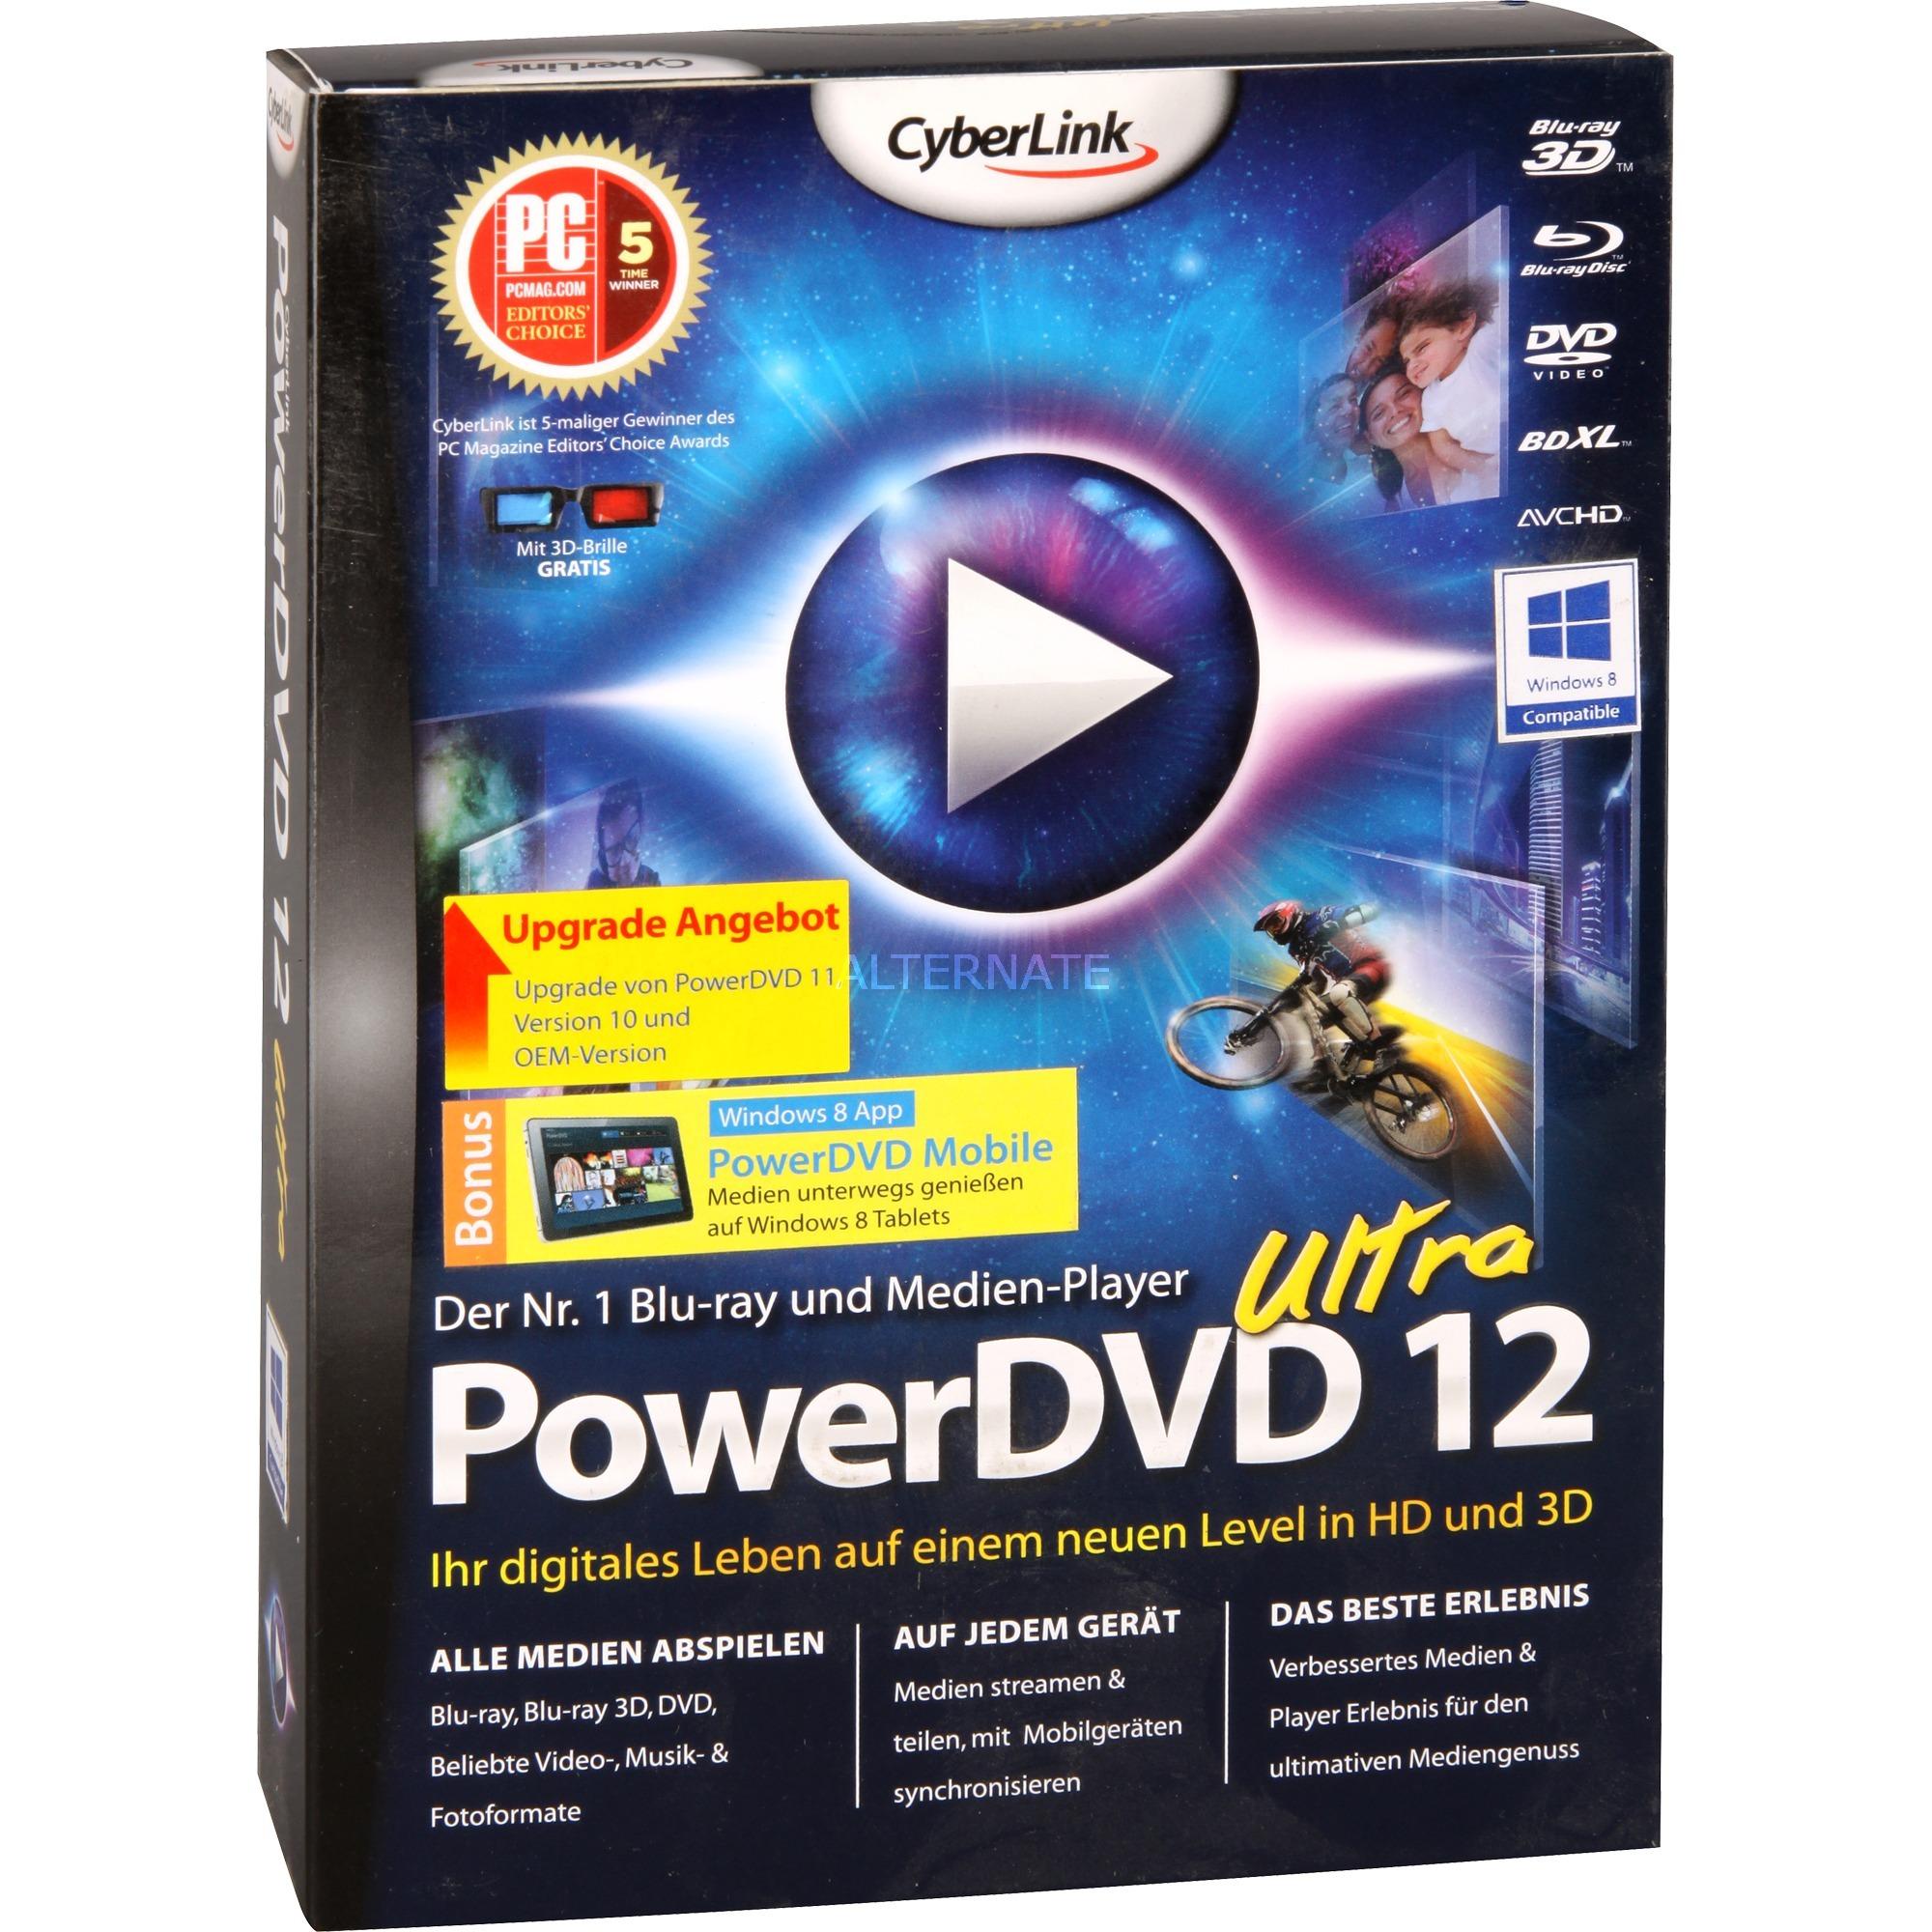 aacs license key update powerdvd 14